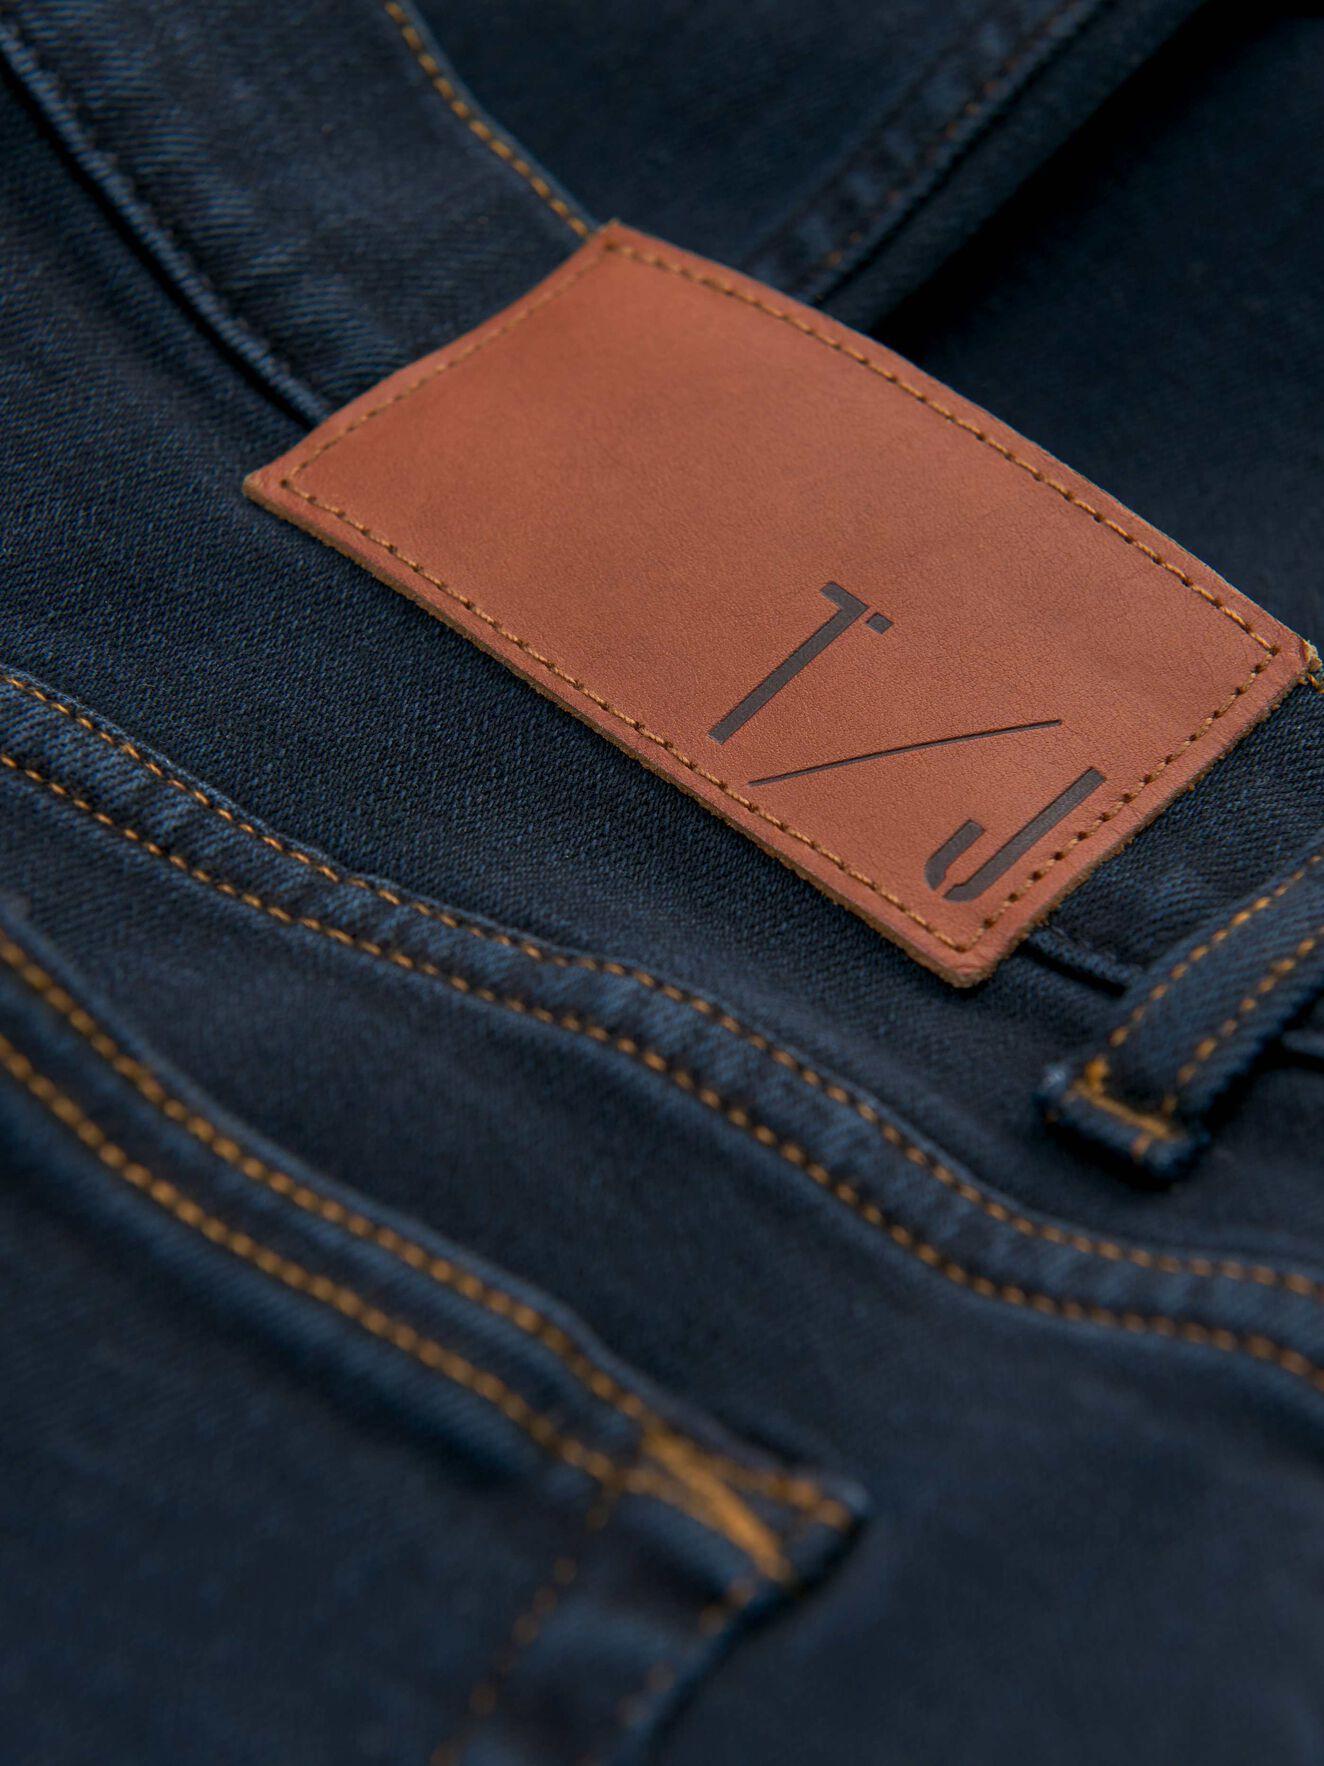 Evolve Jeans in Royal Blue from Tiger of Sweden